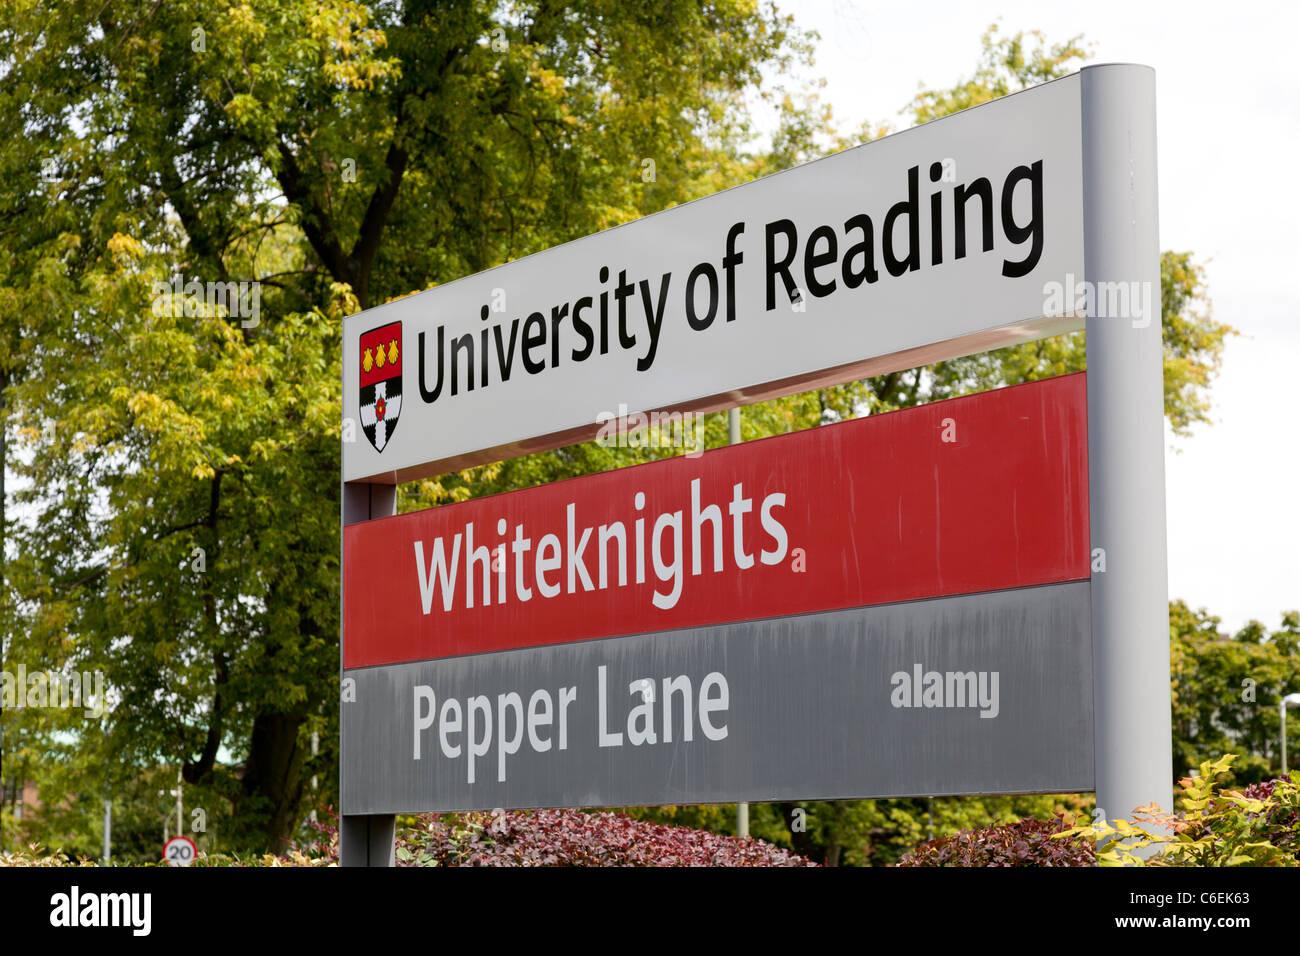 Whiteknights University of Reading sign board - Stock Image